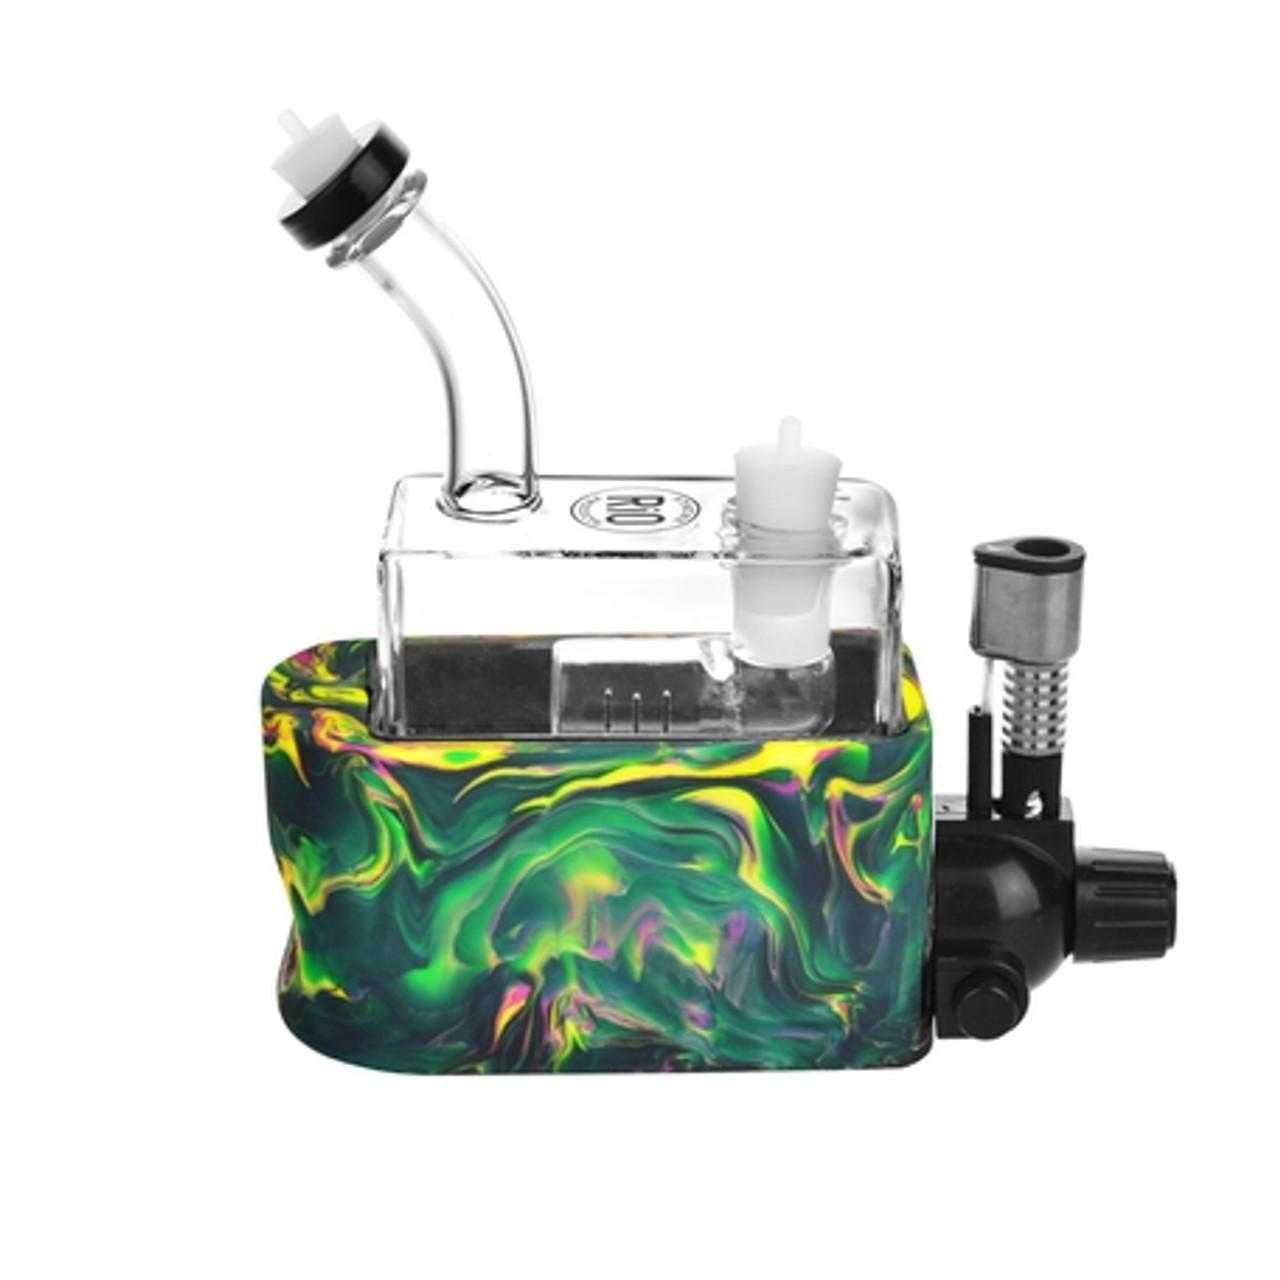 "Rio Portable Dab Unit - 6.25"" Assorted Colors"